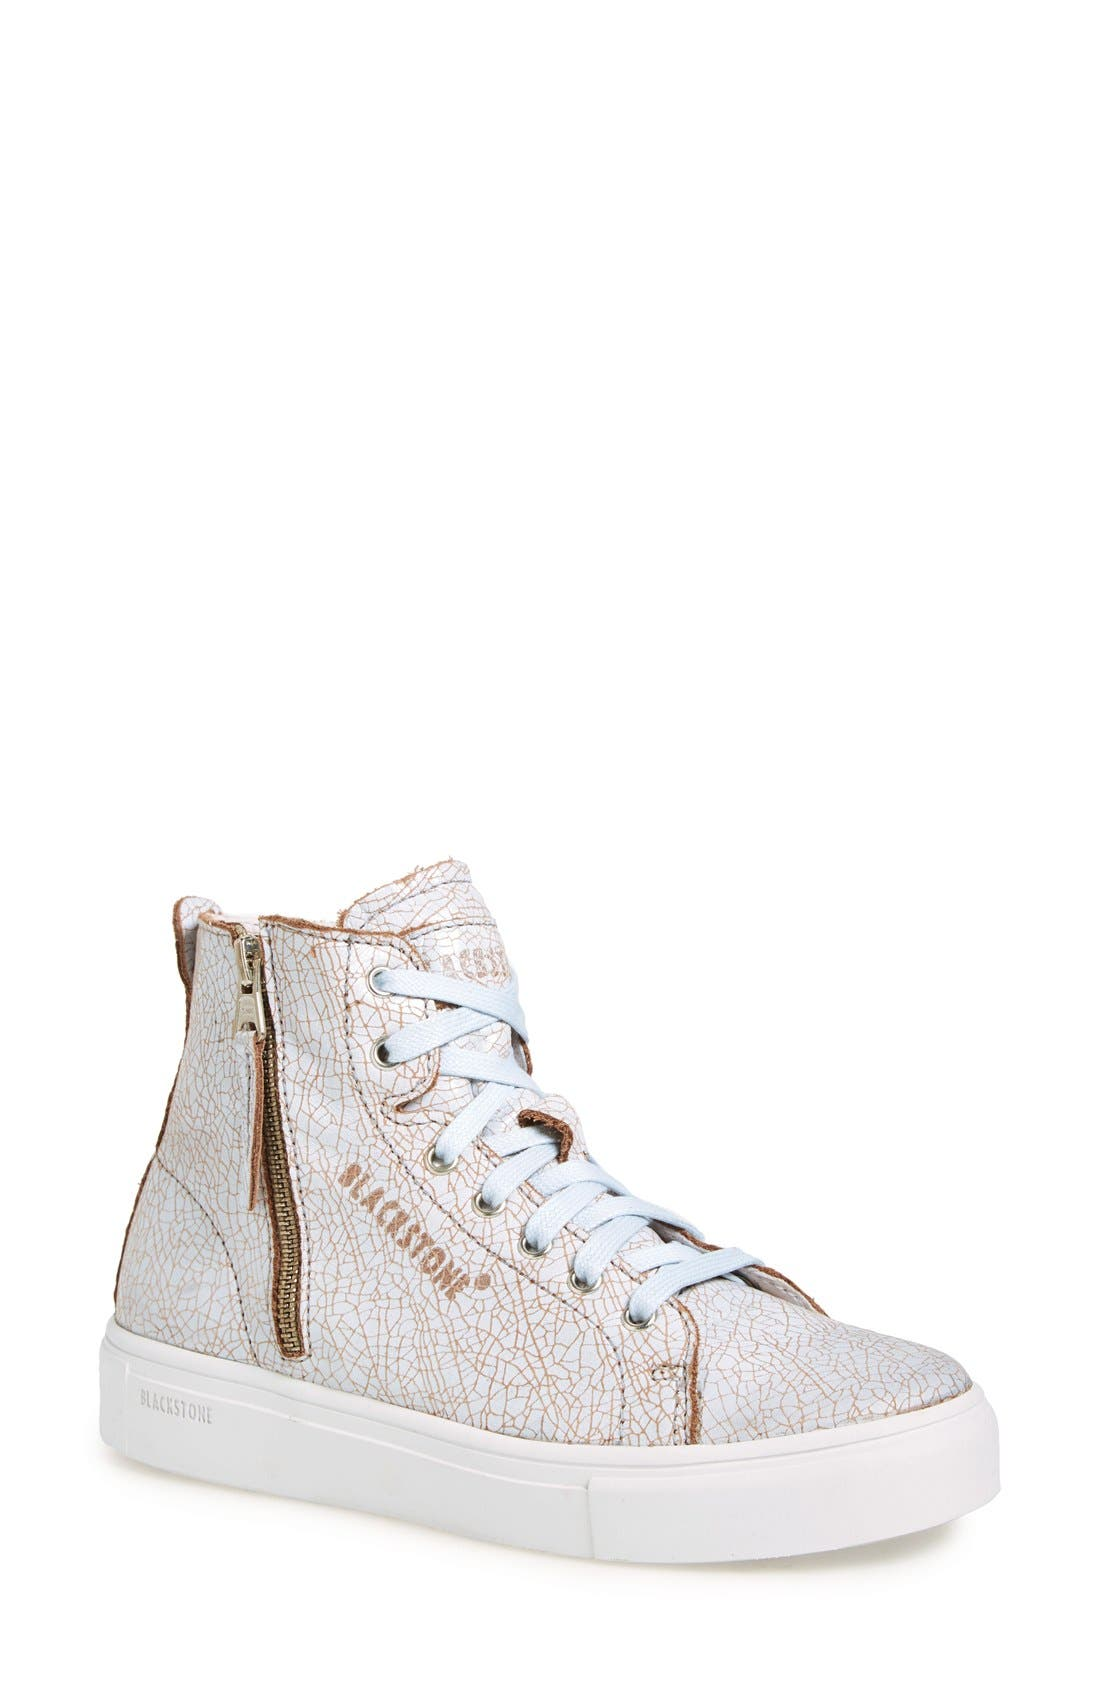 Main Image - Blackstone 'LL78' Crackled High Top Platform Sneaker (Women)